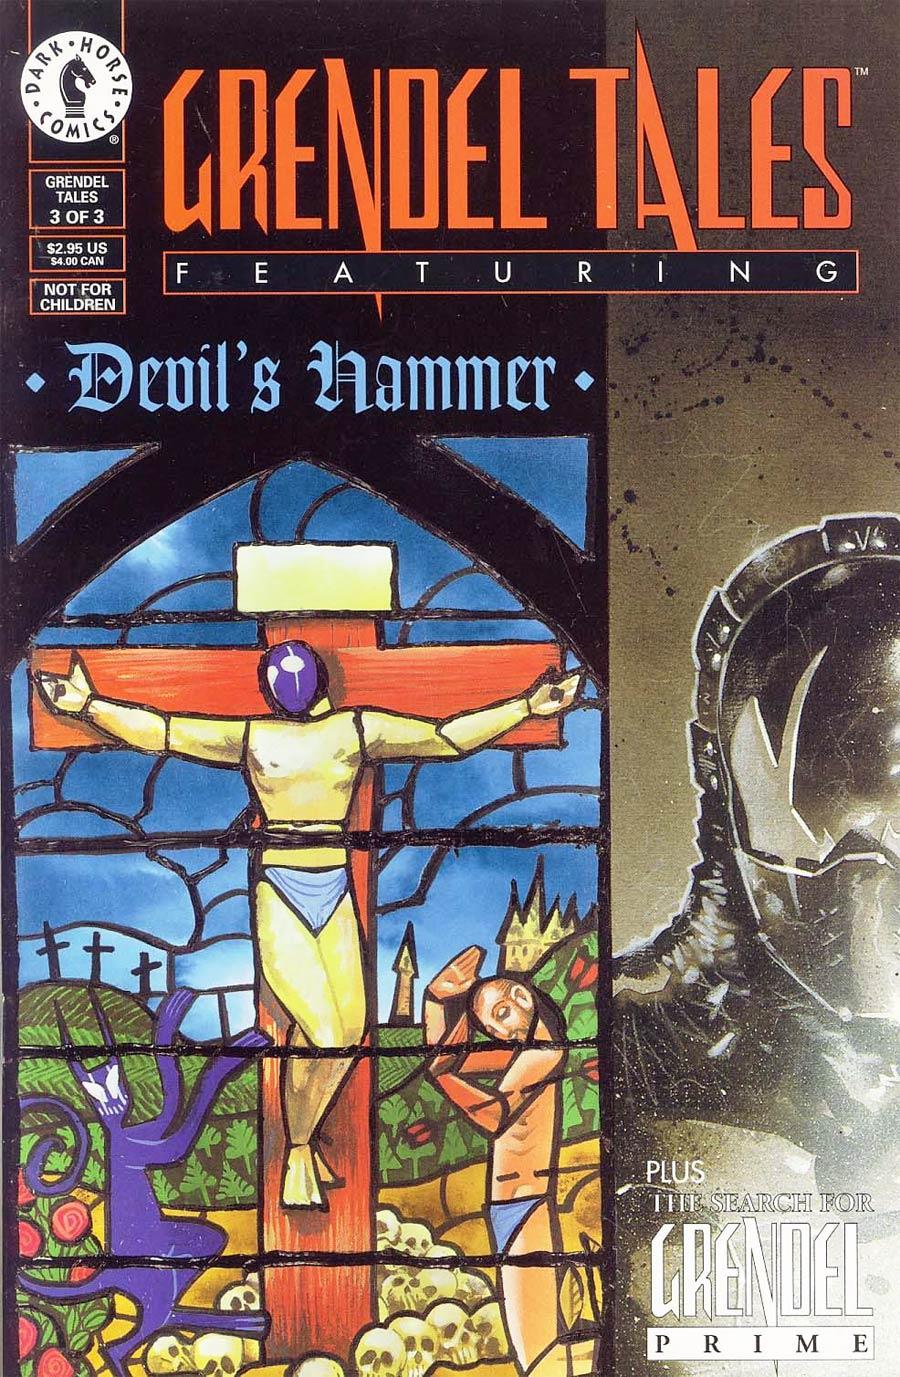 Grendel Tales The Devils Hammer #3